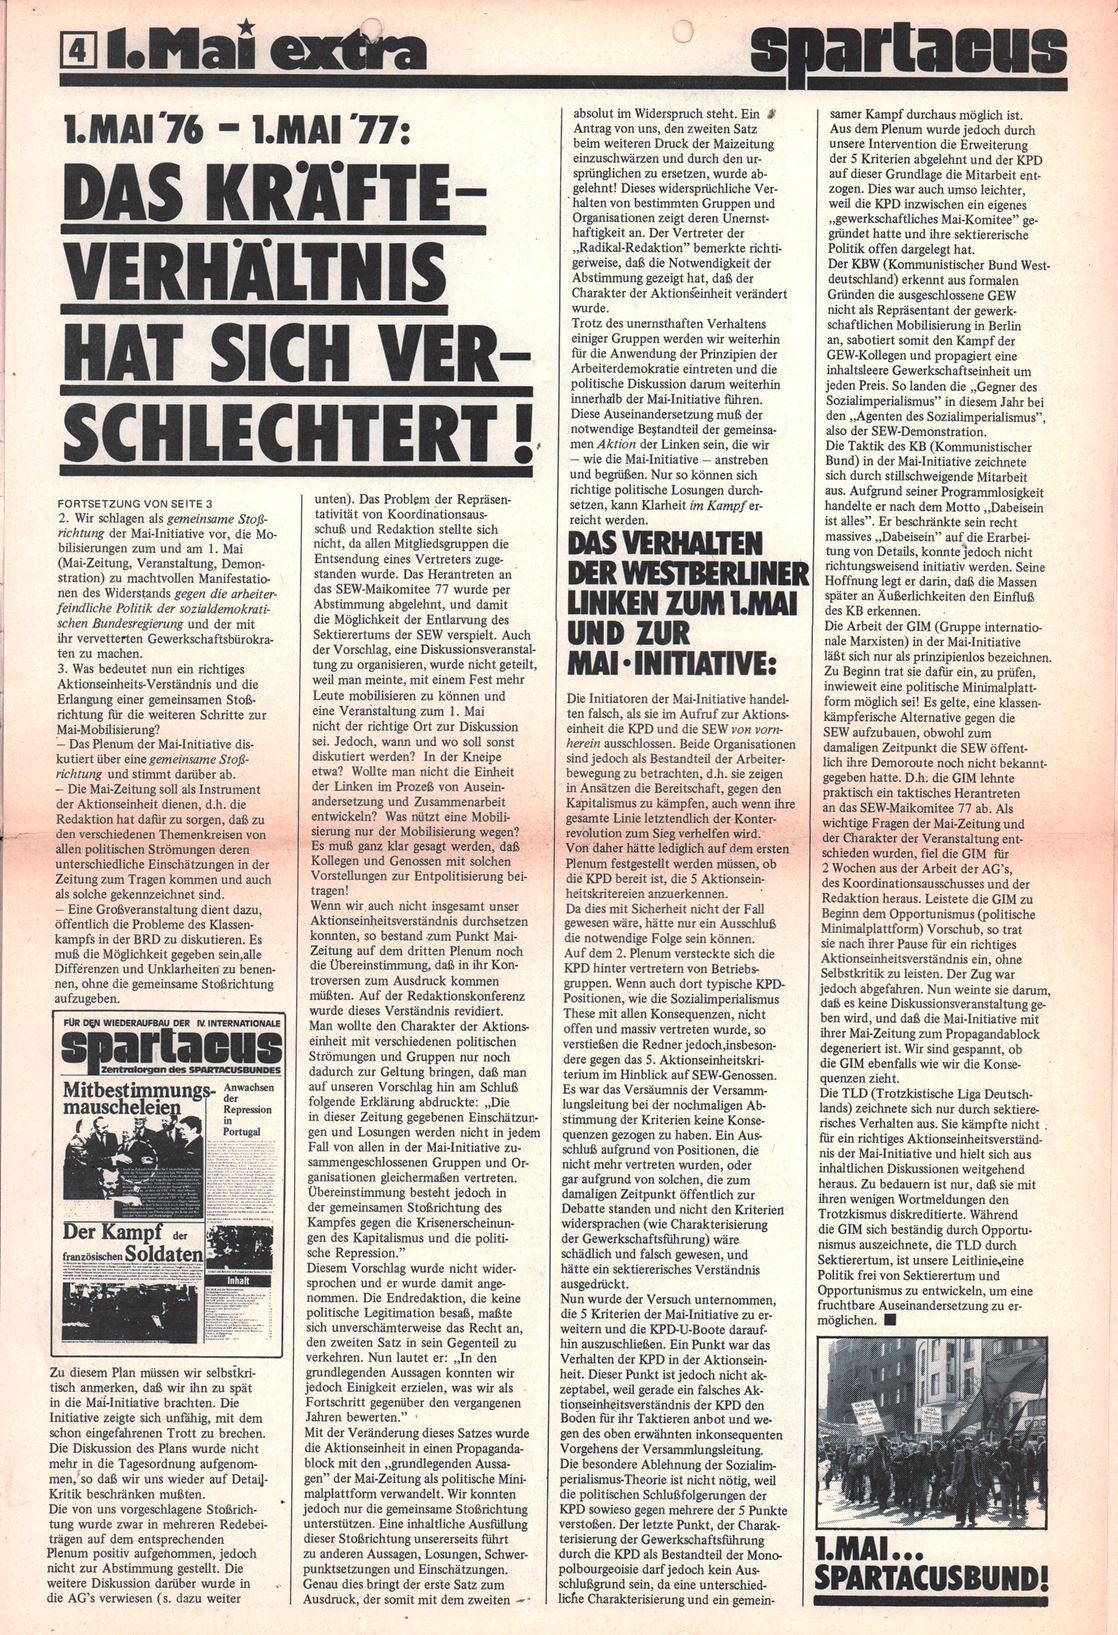 Berlin_Spartacus_554